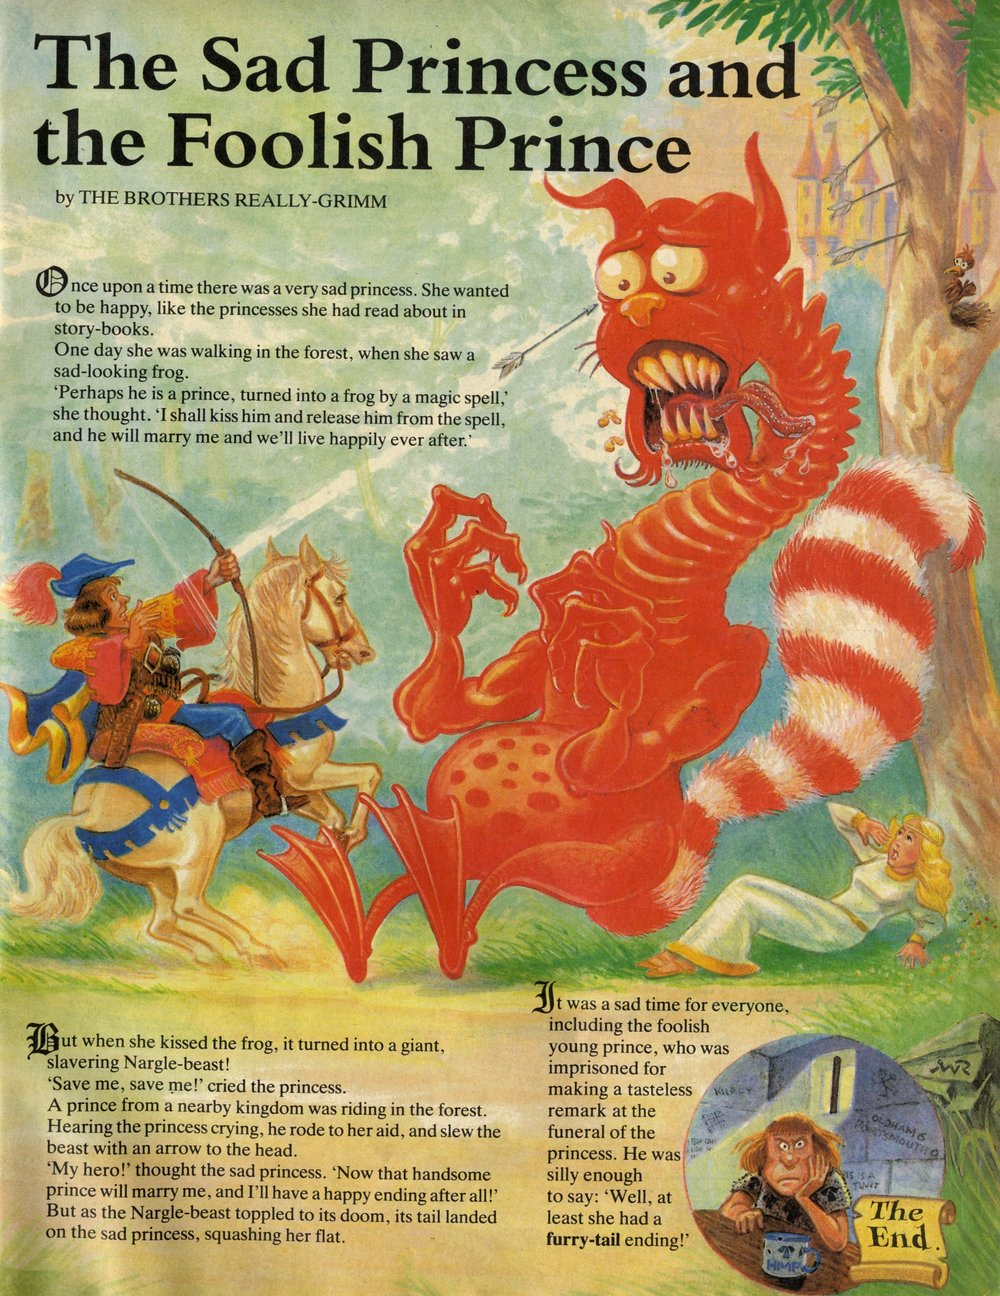 The Sad Princess and the Foolish Prince: creators unknown